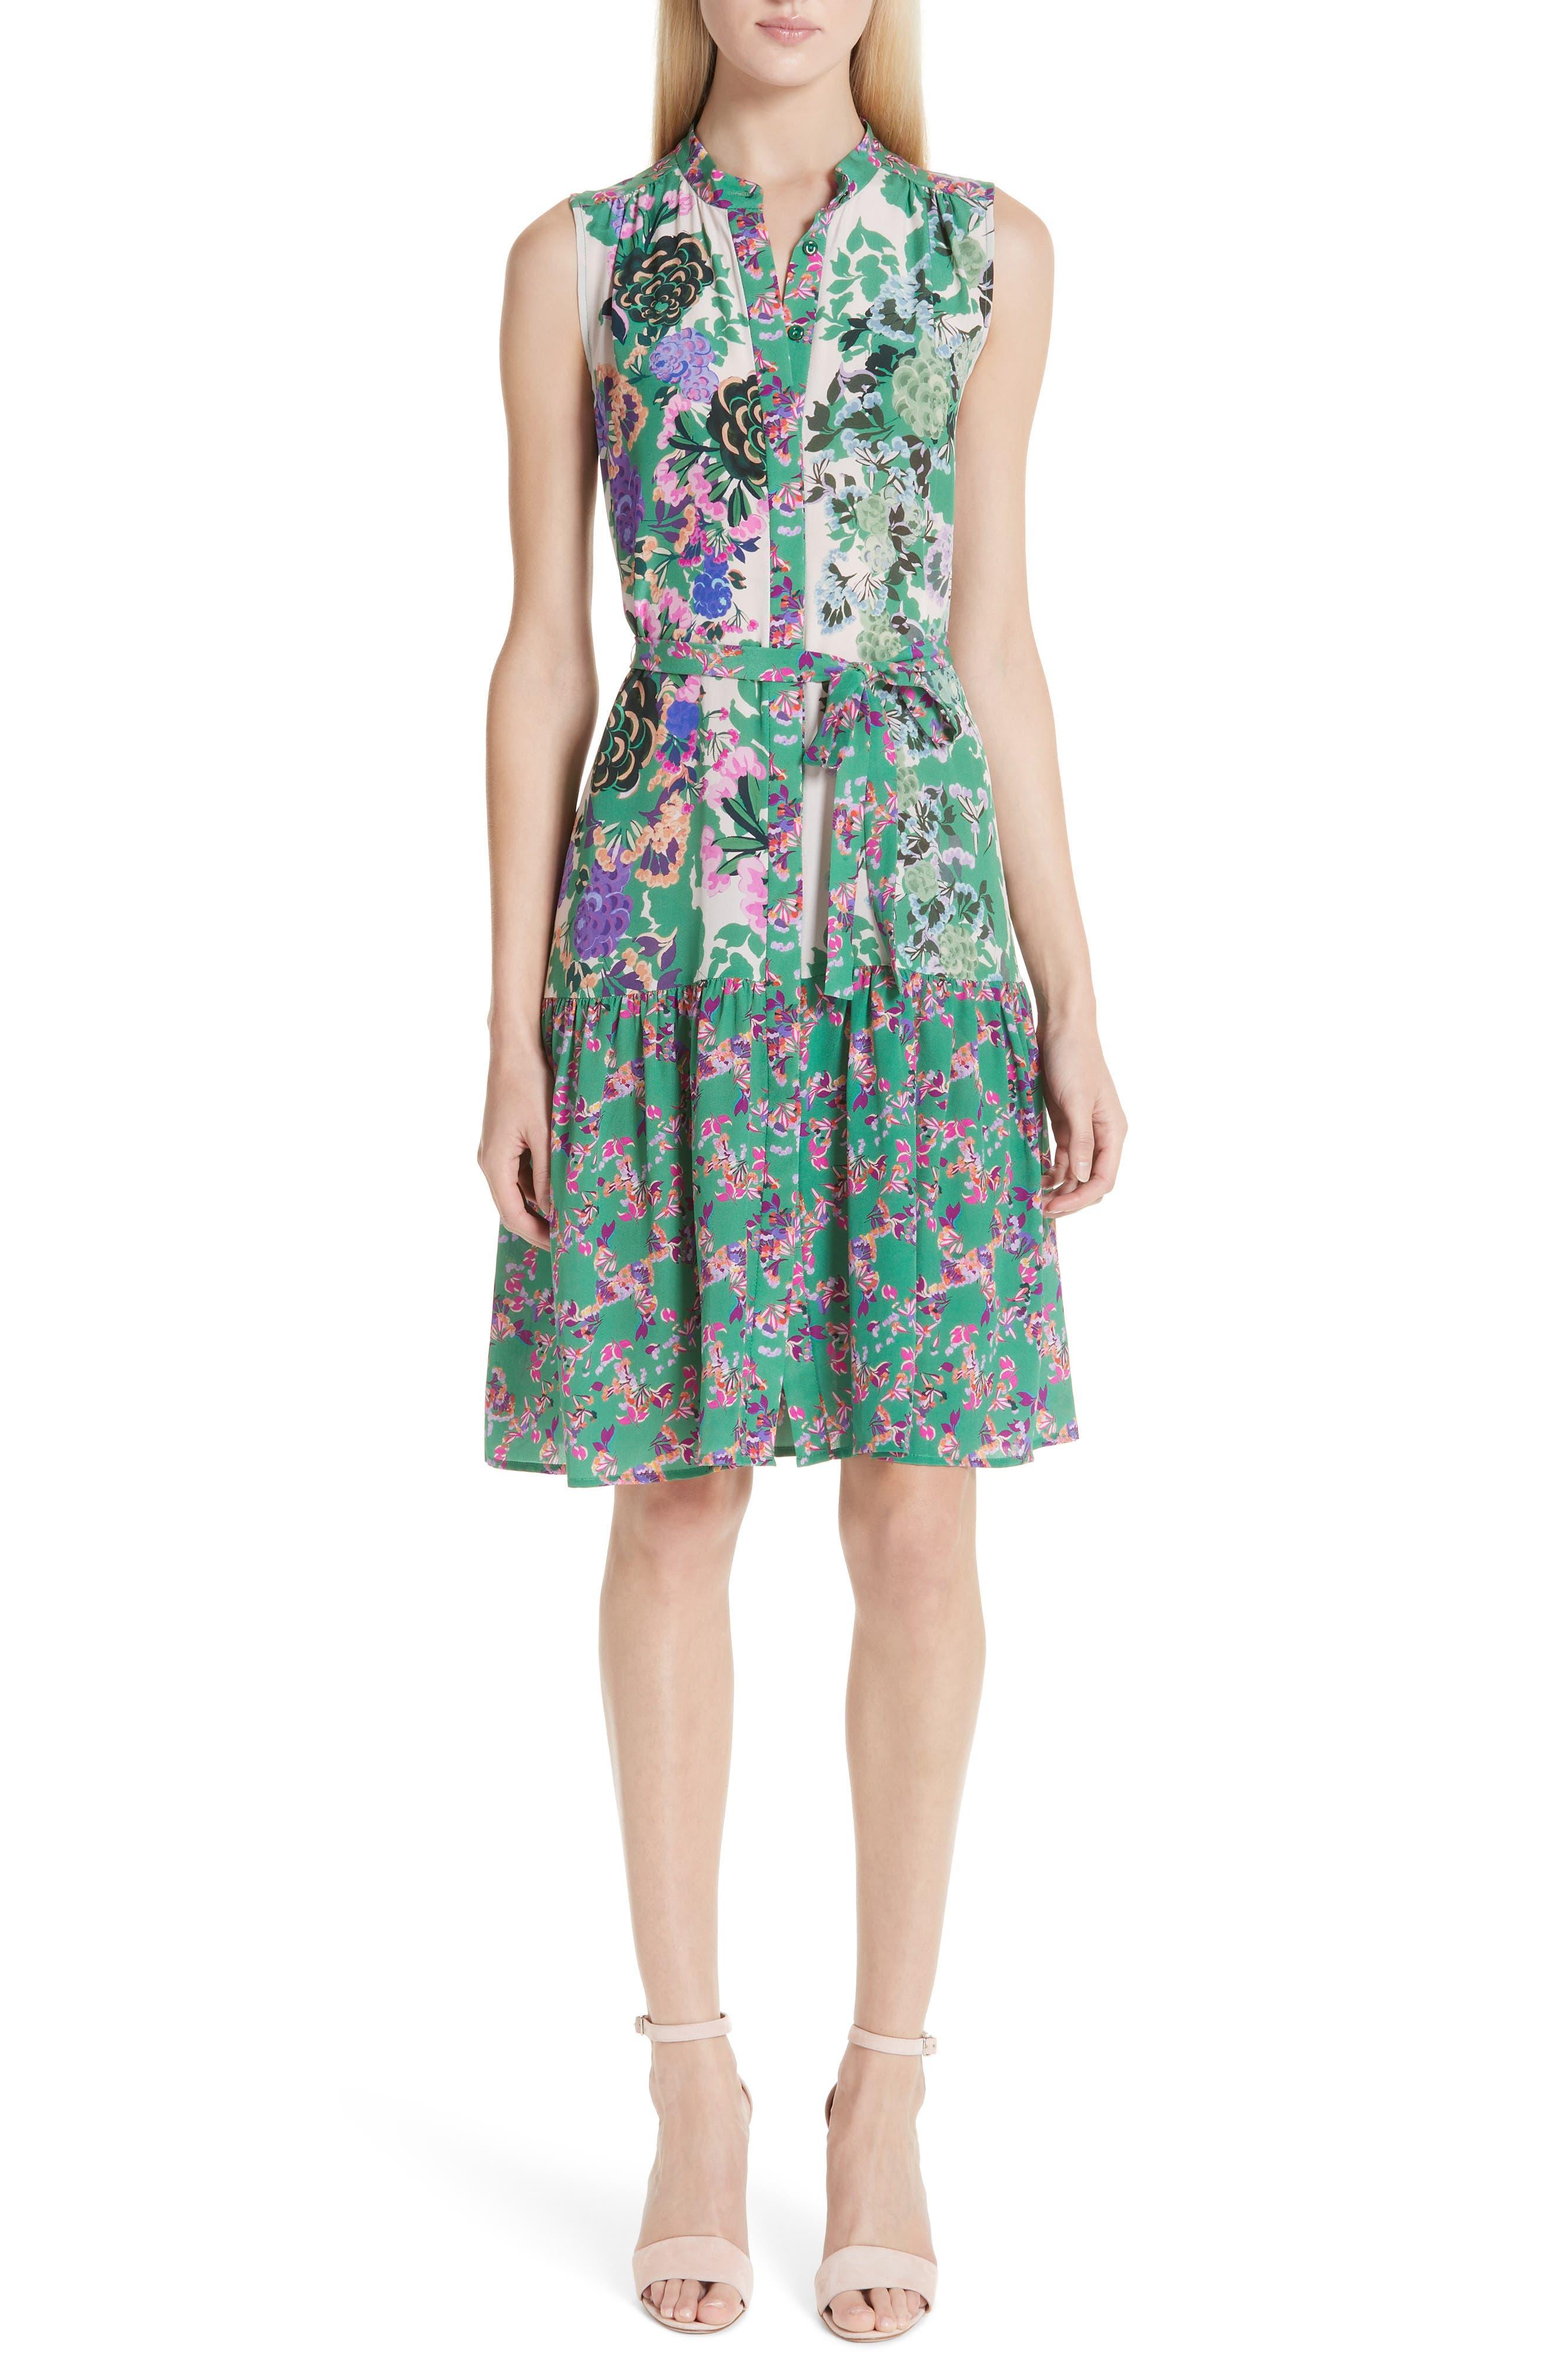 SALONI, Tilly Print Silk Dress, Main thumbnail 1, color, ROSE MEADOW PLMT